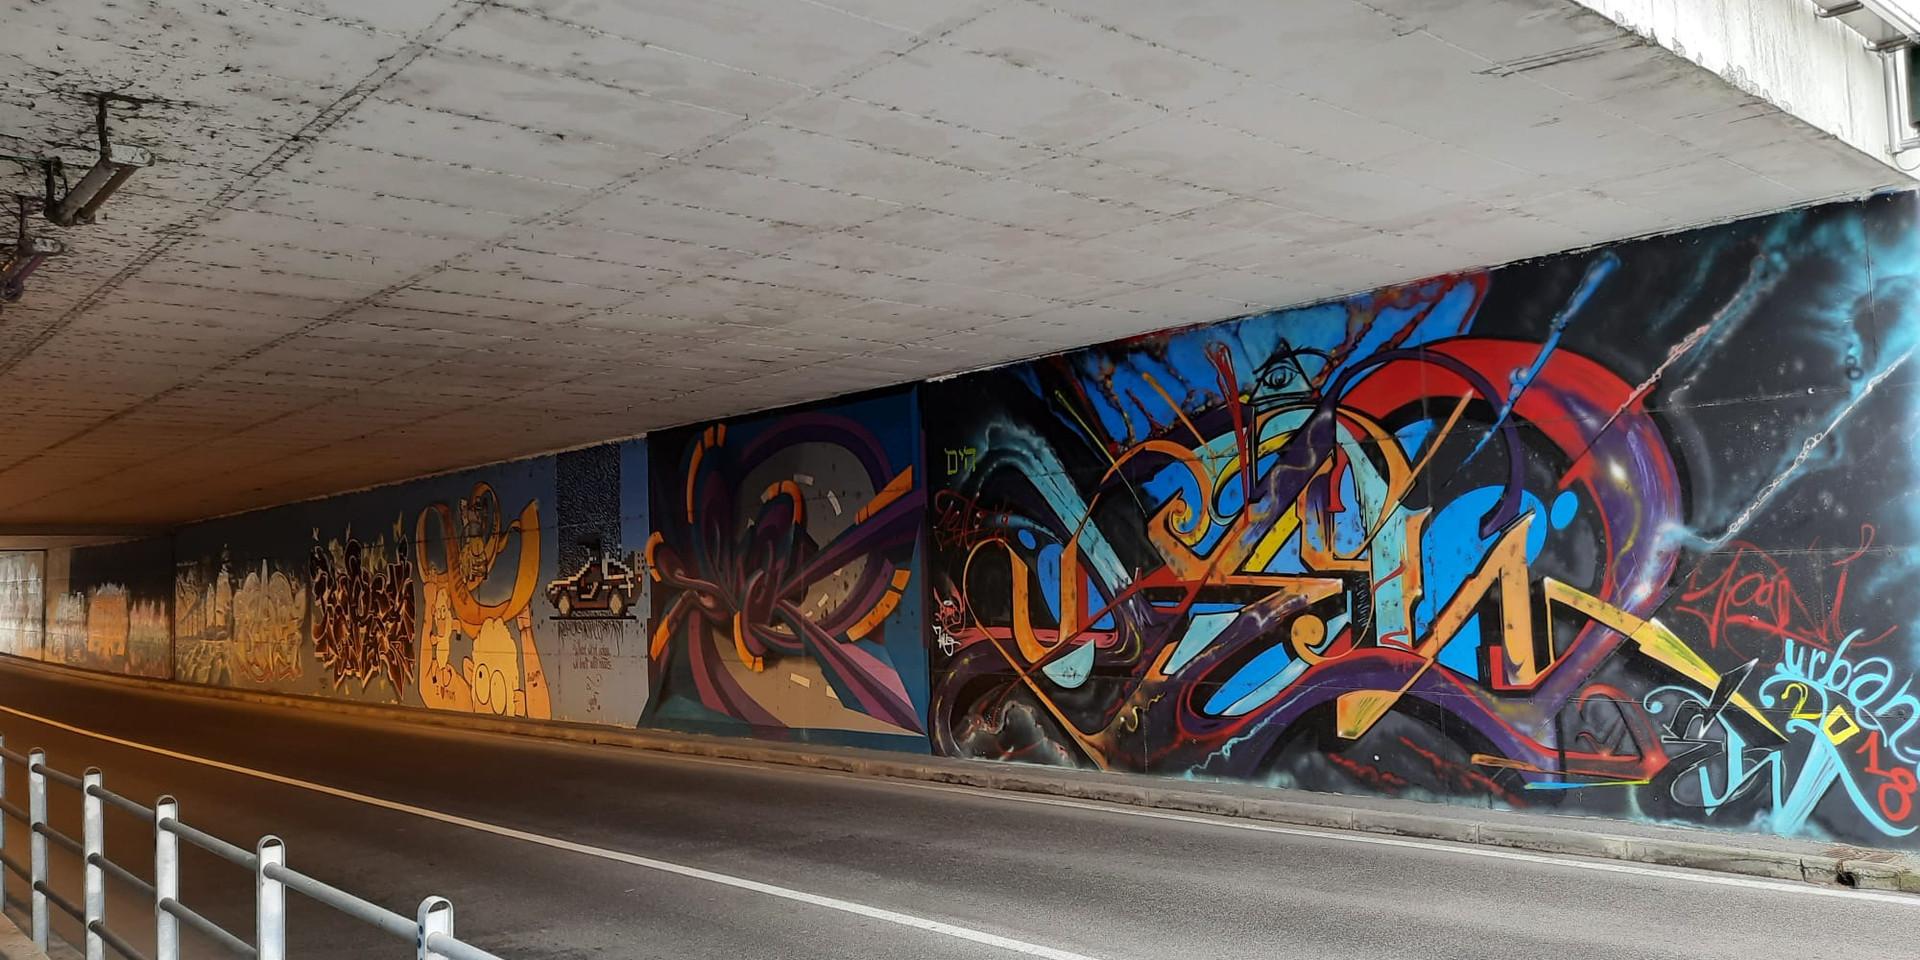 graffiti3.jpeg